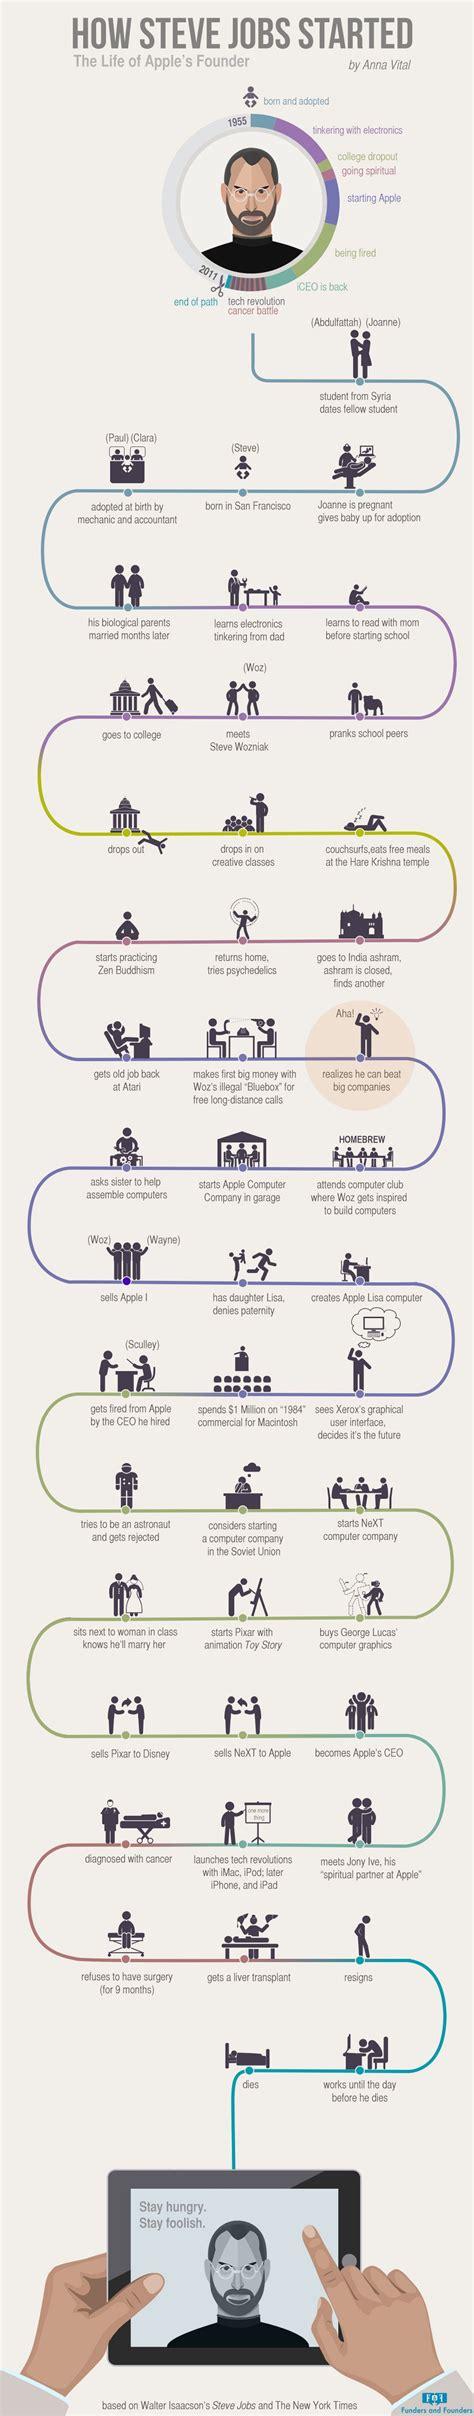 life of steve jobs infographic infographic how steve jobs started